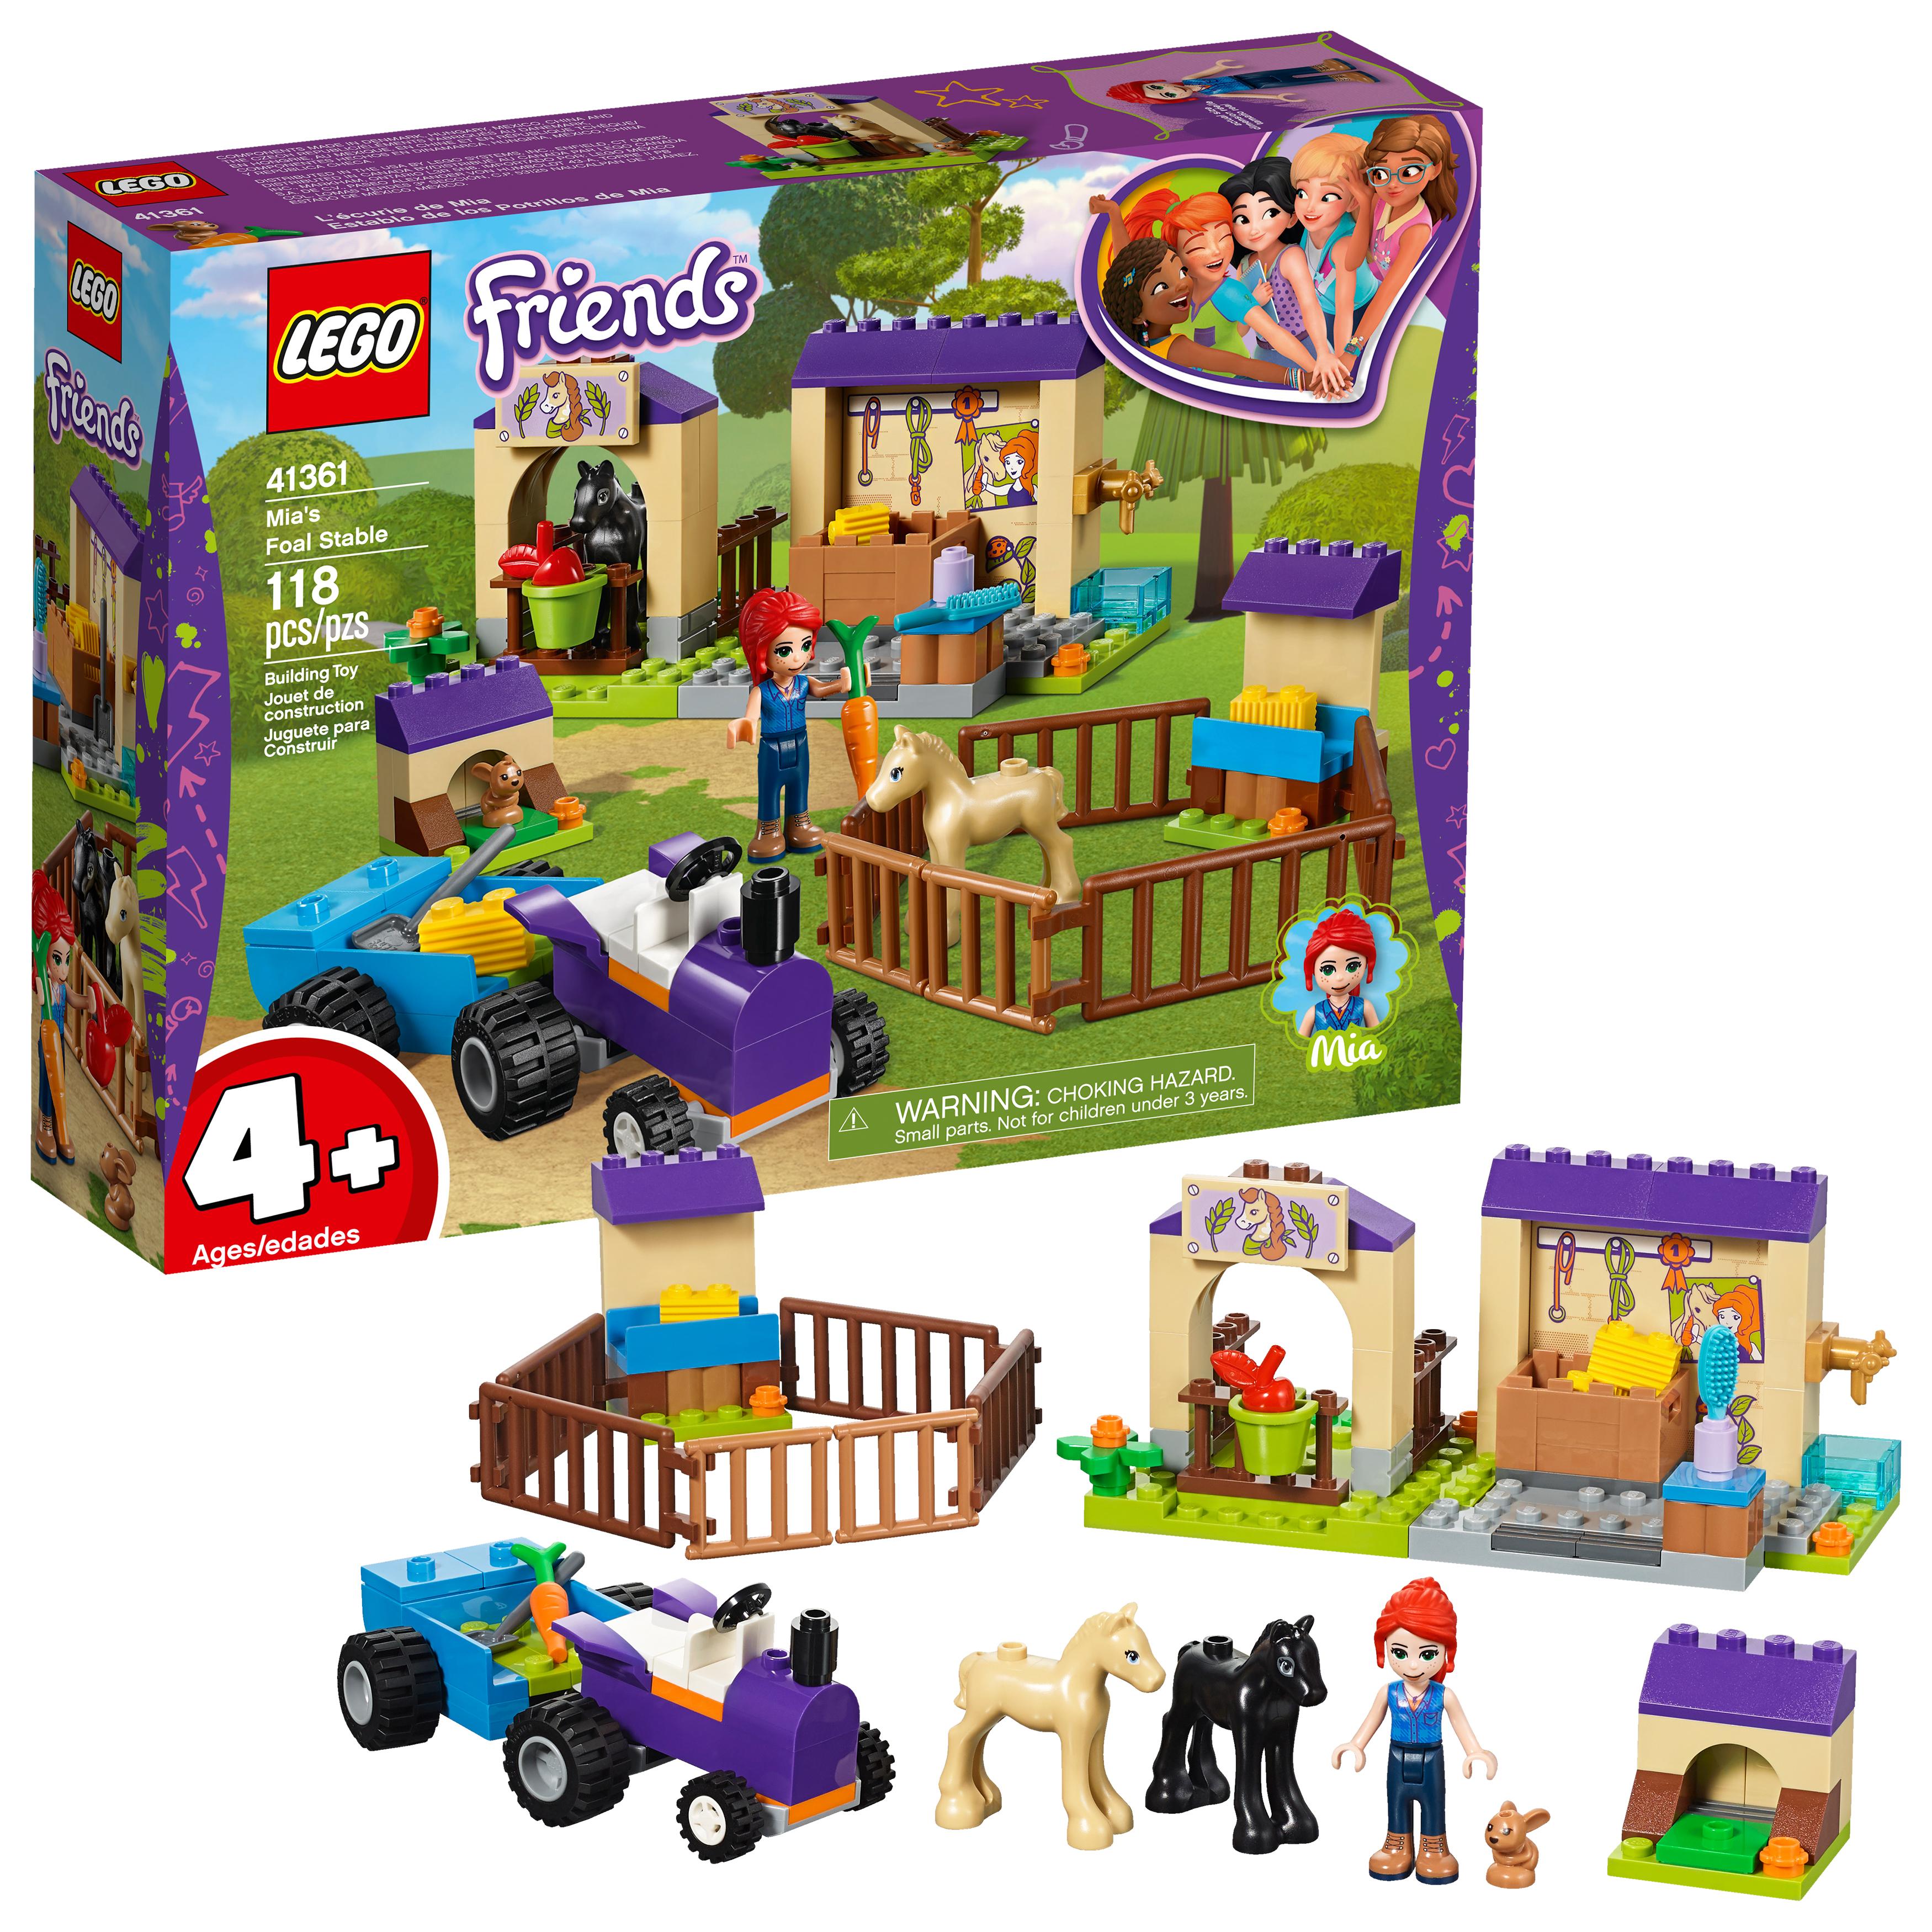 LEGO Friends 4+ Mia's Foal Stable 41361 Building Set